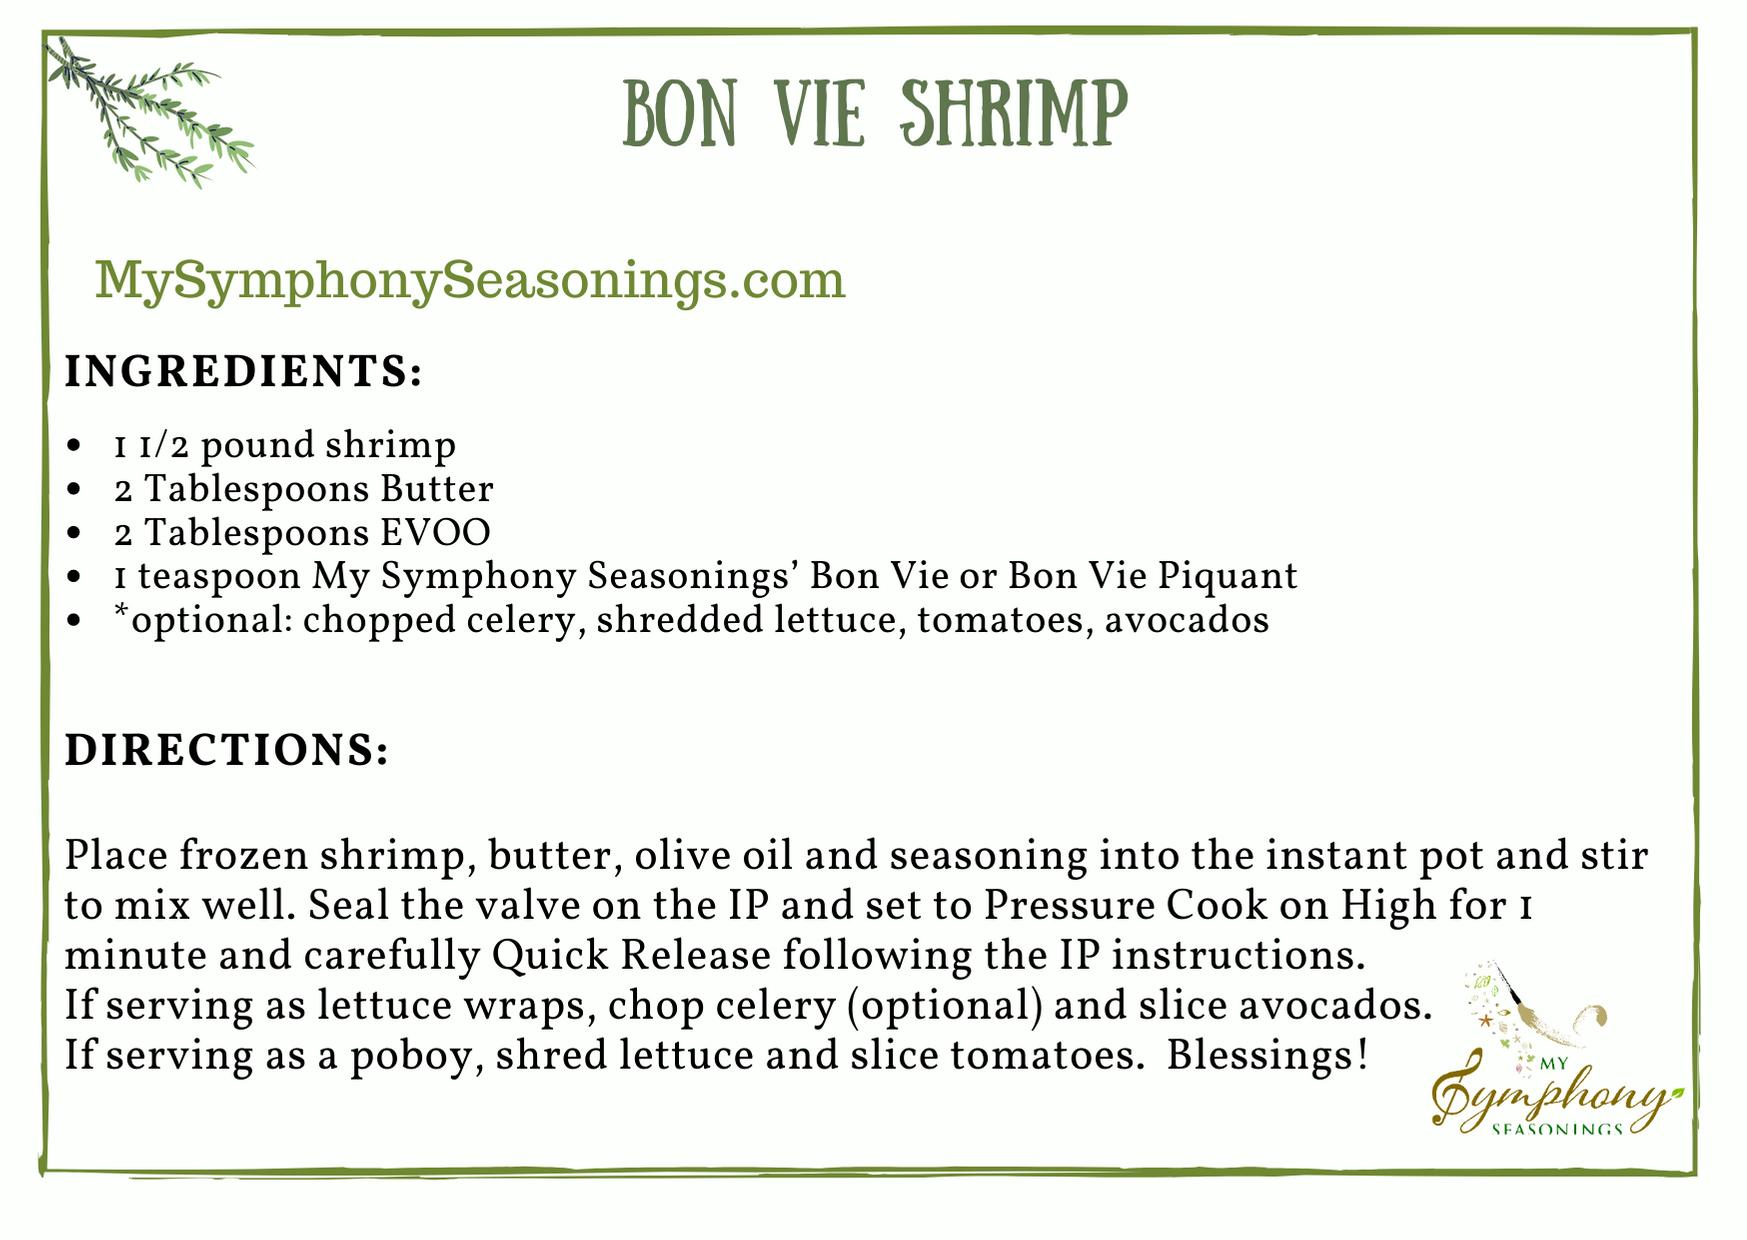 Bon Vie Shrimp